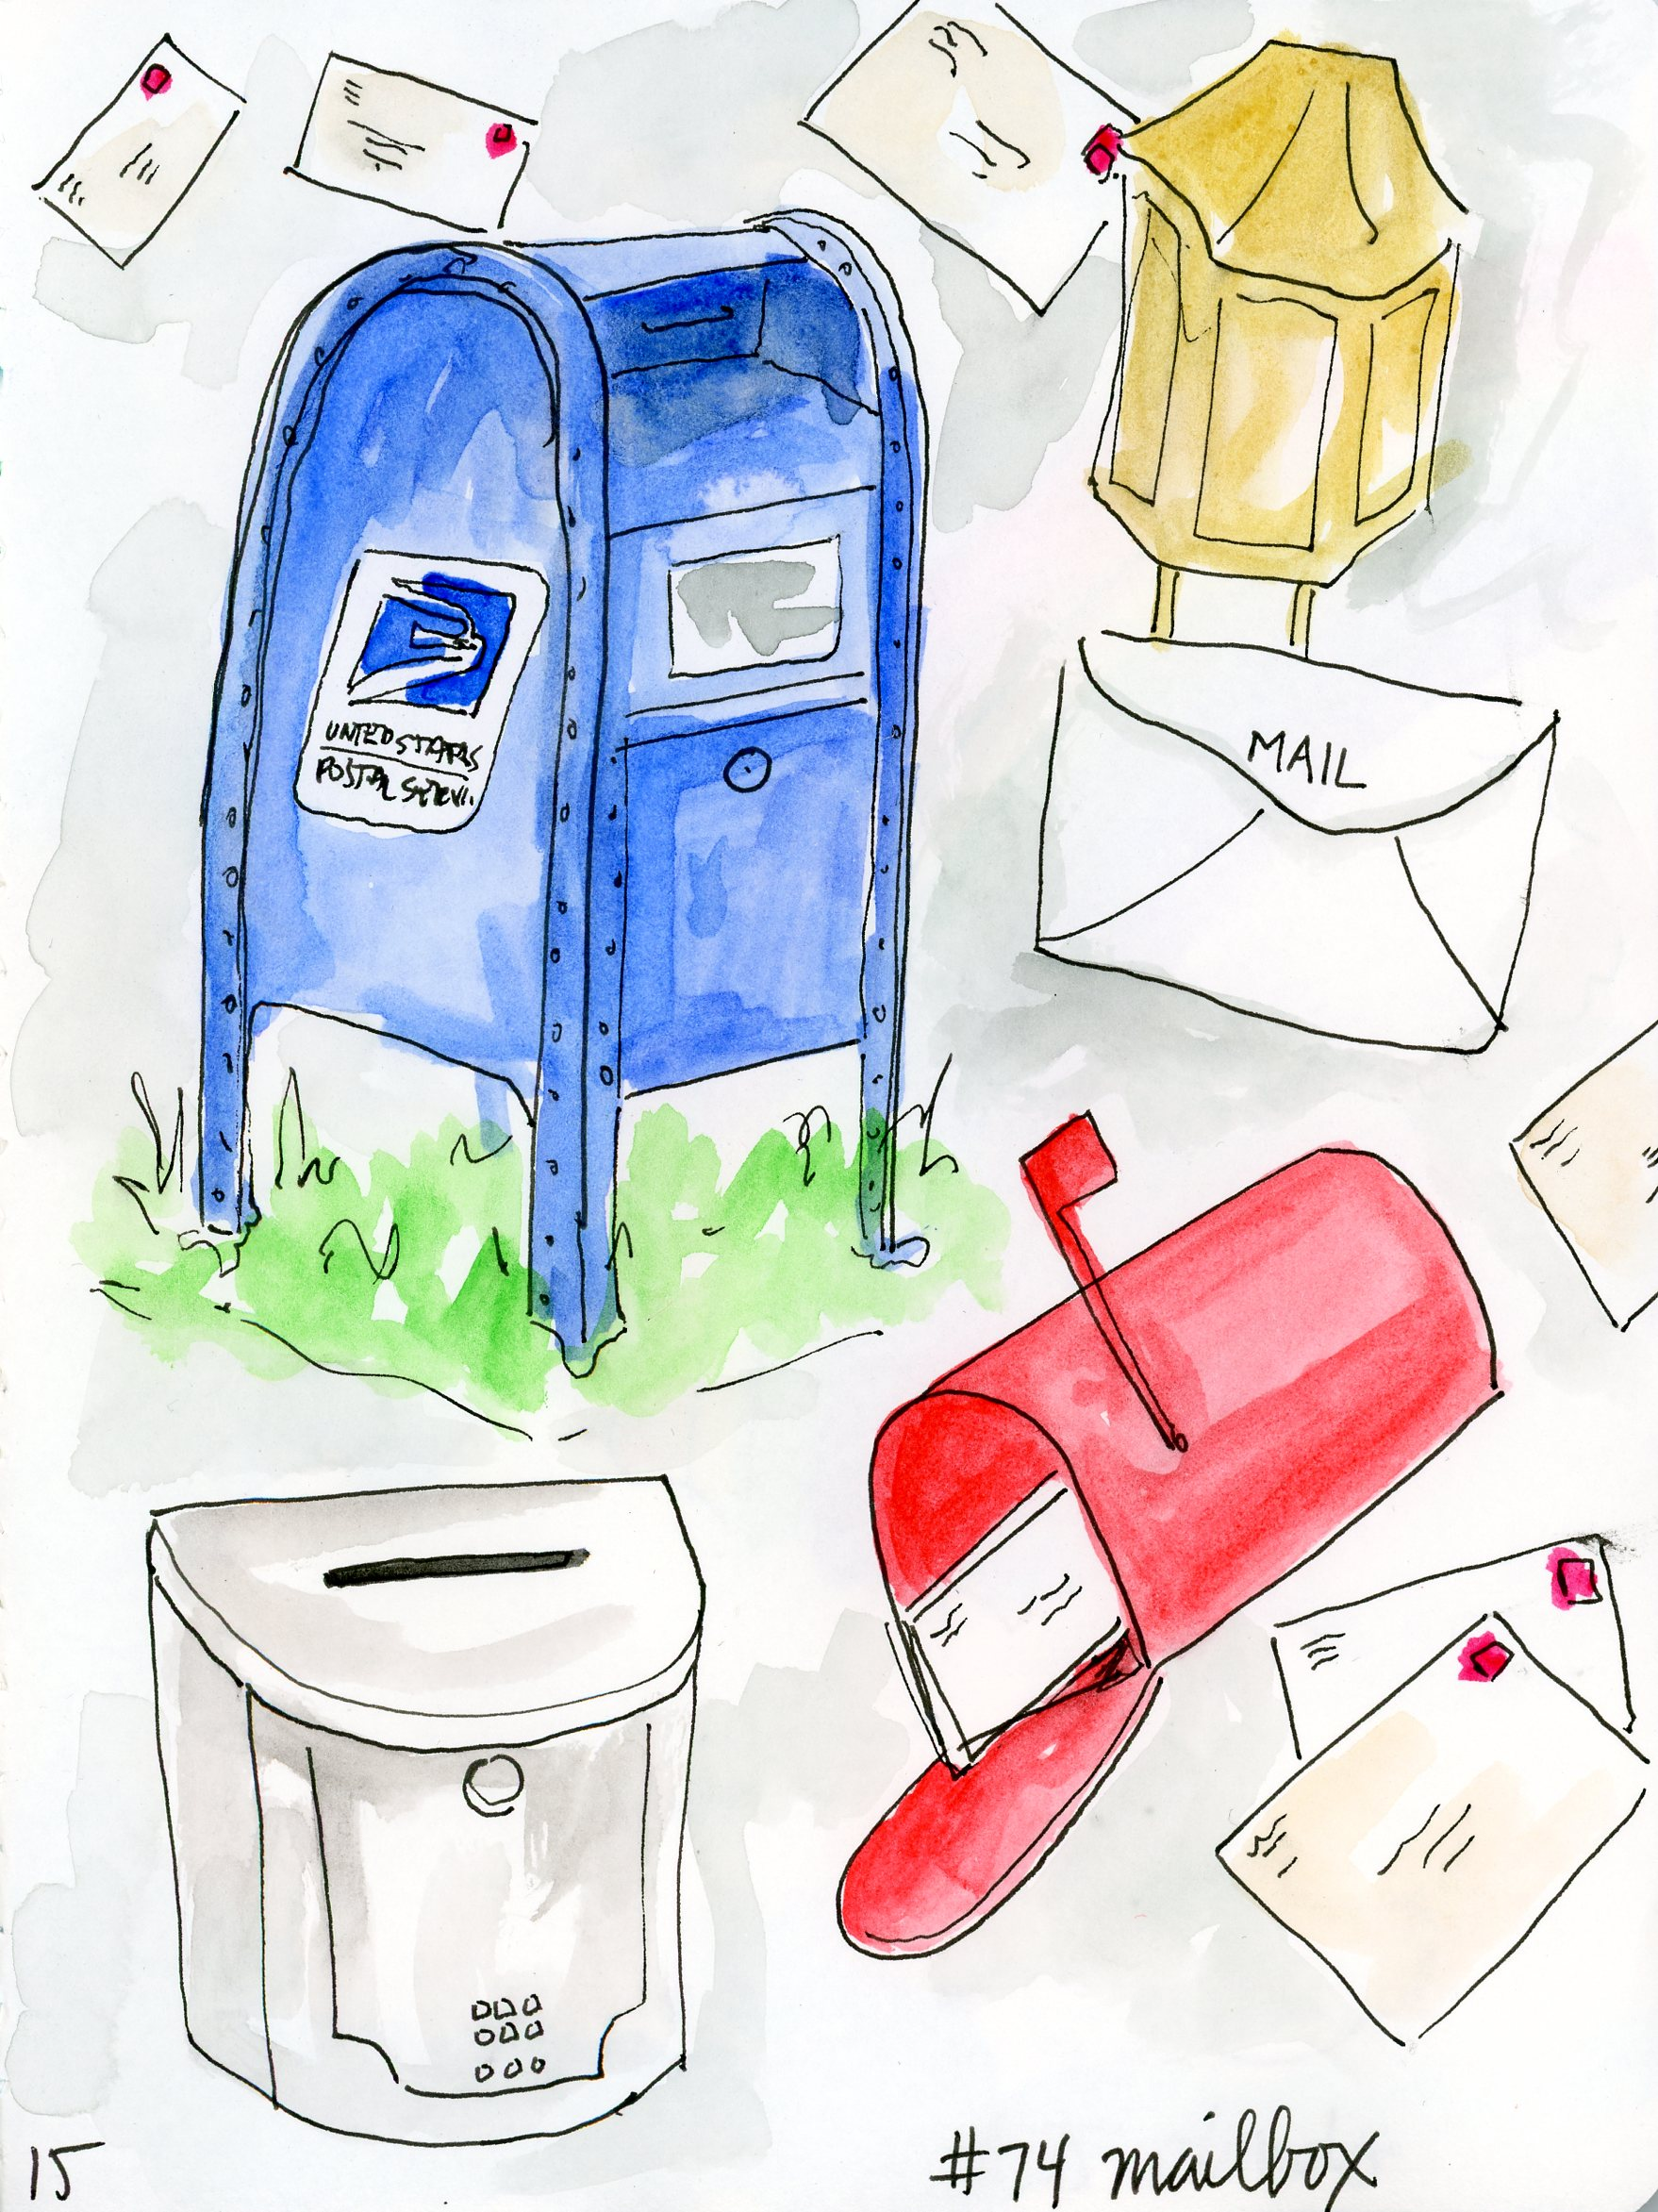 74.mailbox copy.jpg